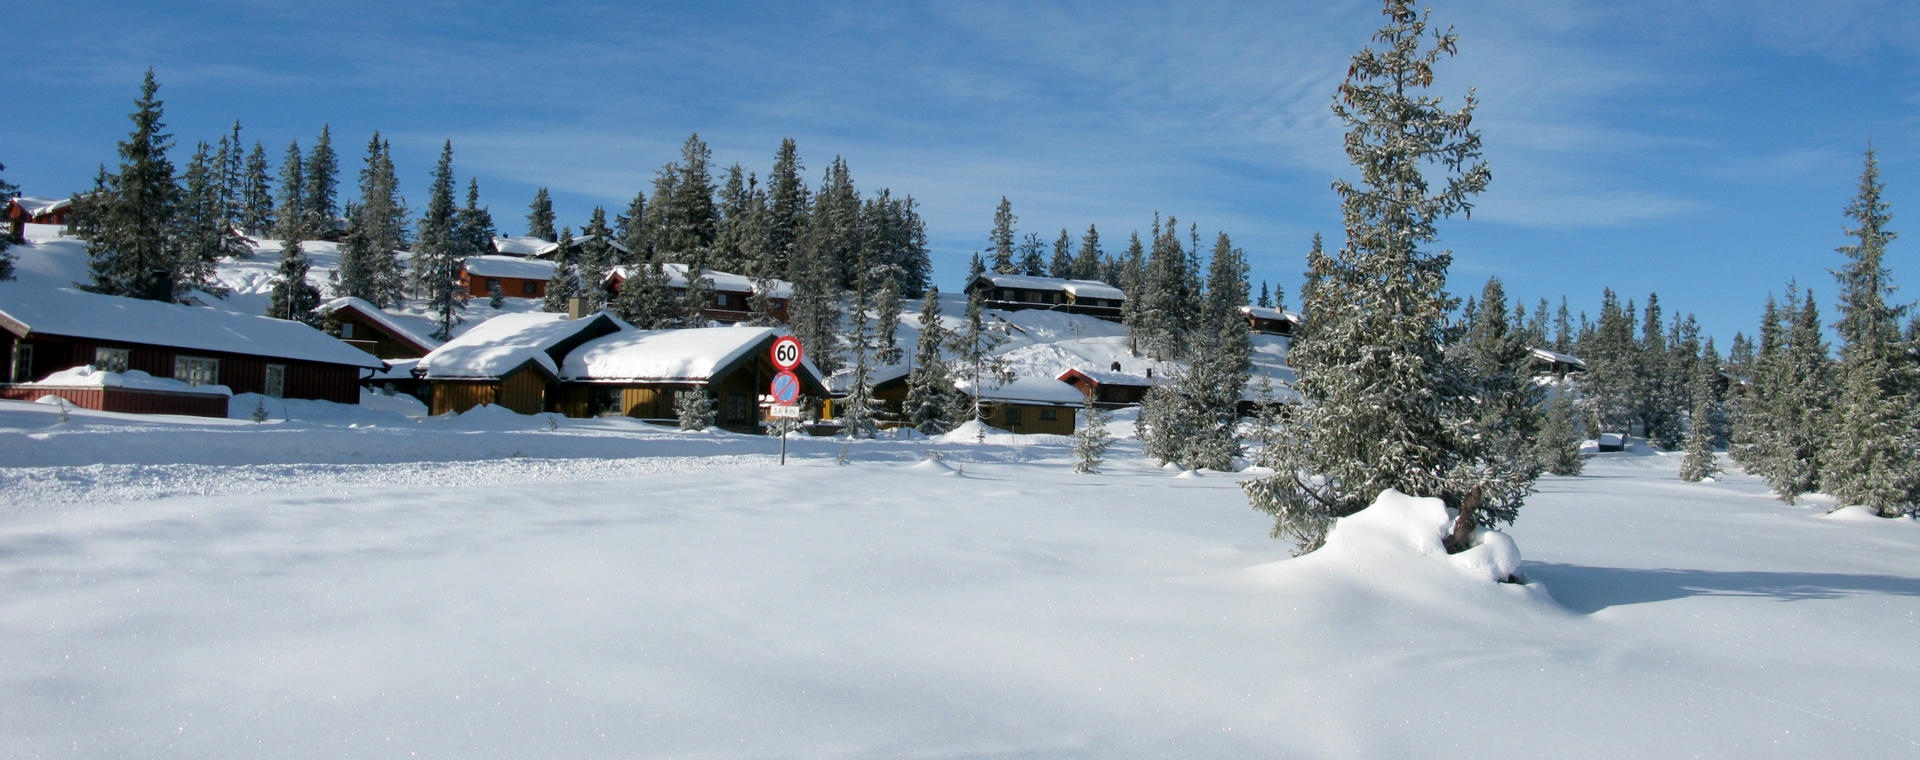 Image Séjour ski de fond à Sjusjøen